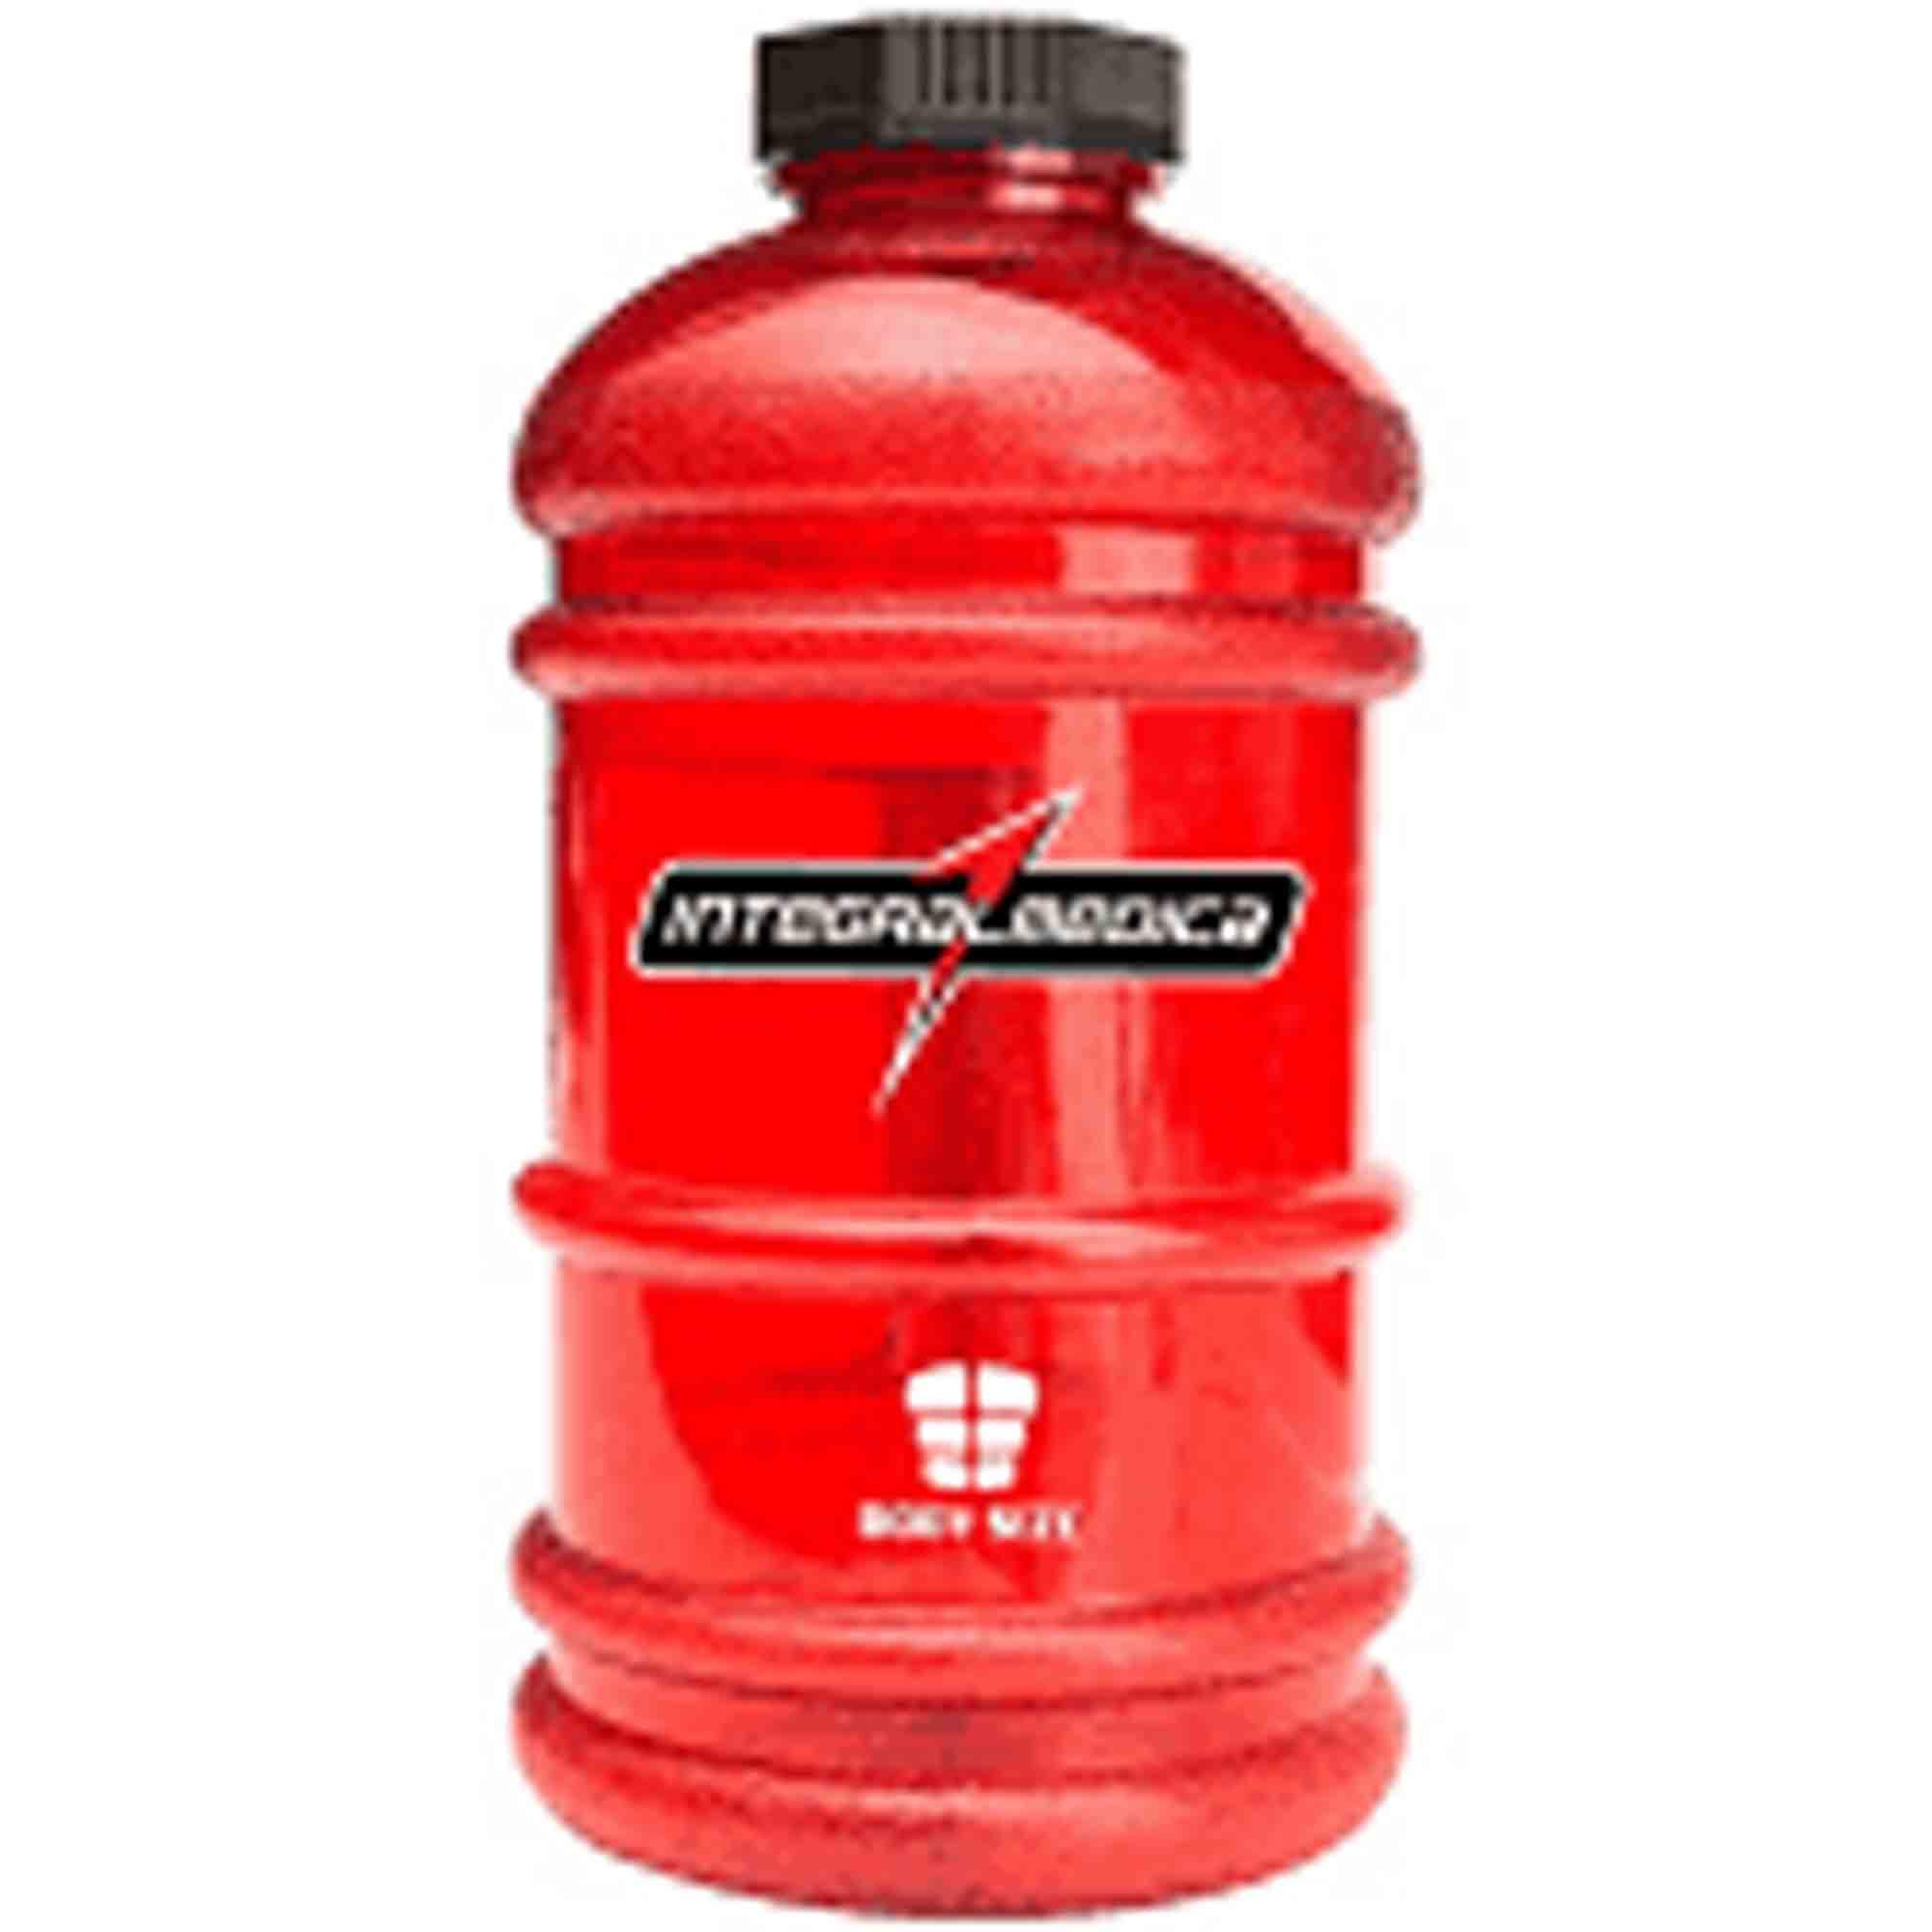 Galão Body Size Vermelho 2,2L Integralmedica